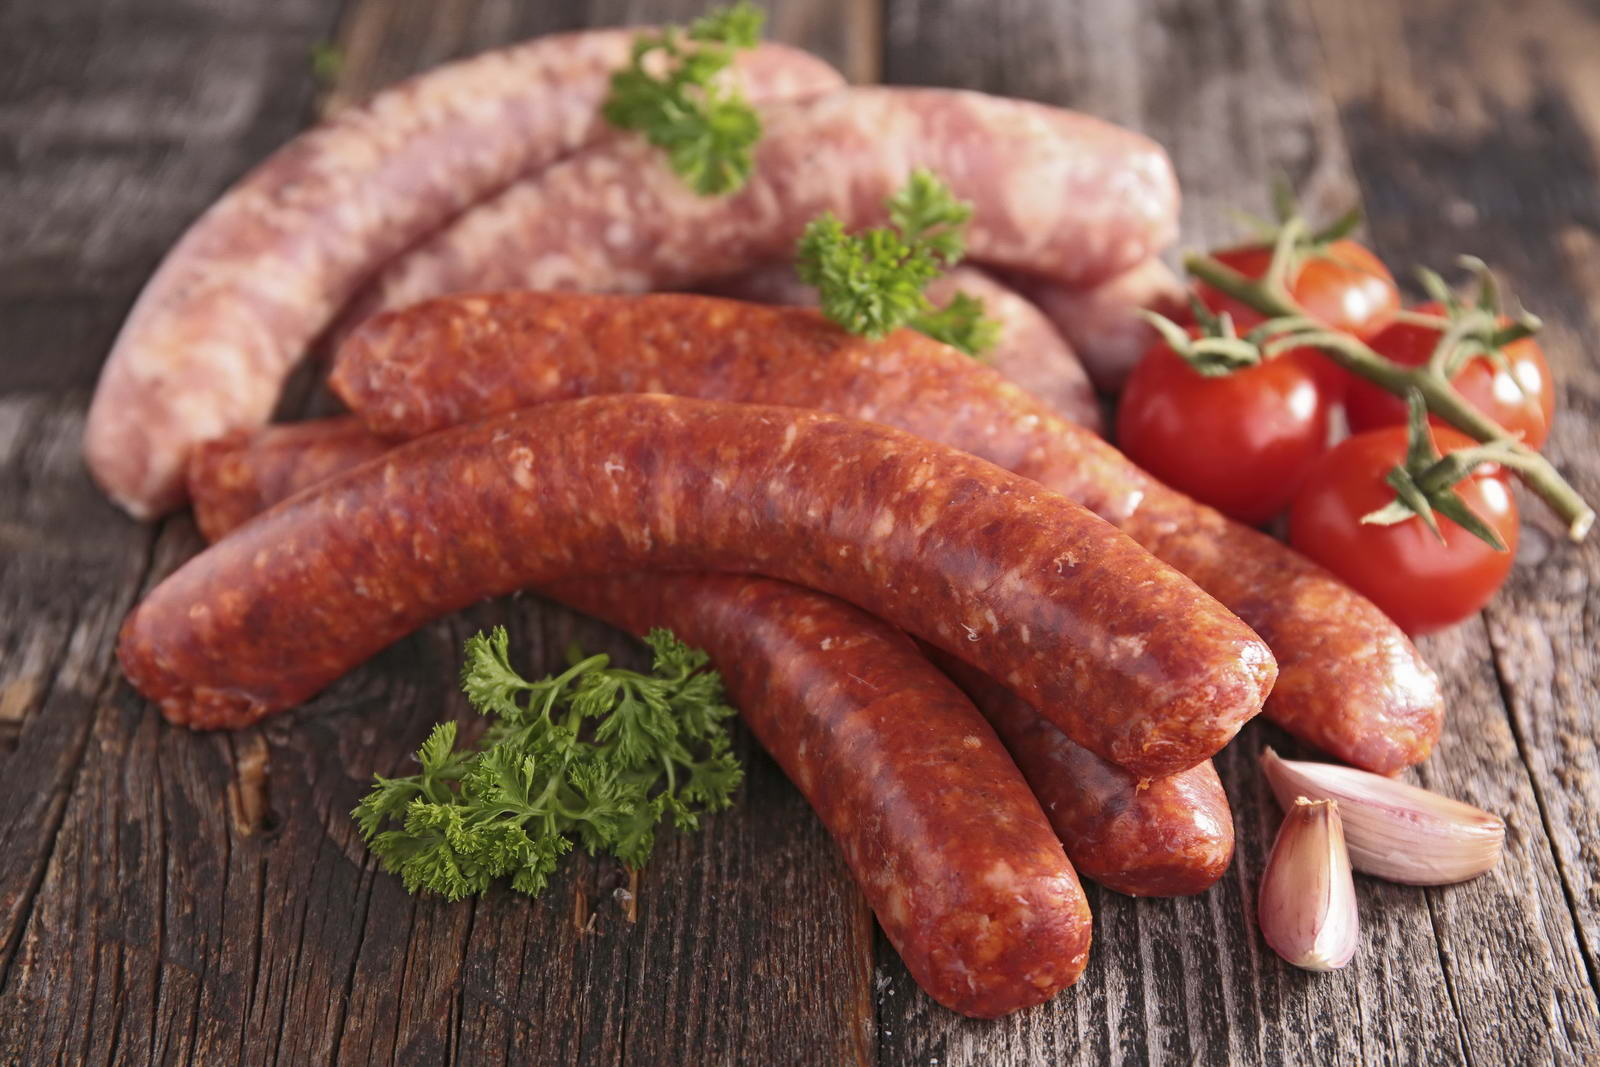 Country Sausage